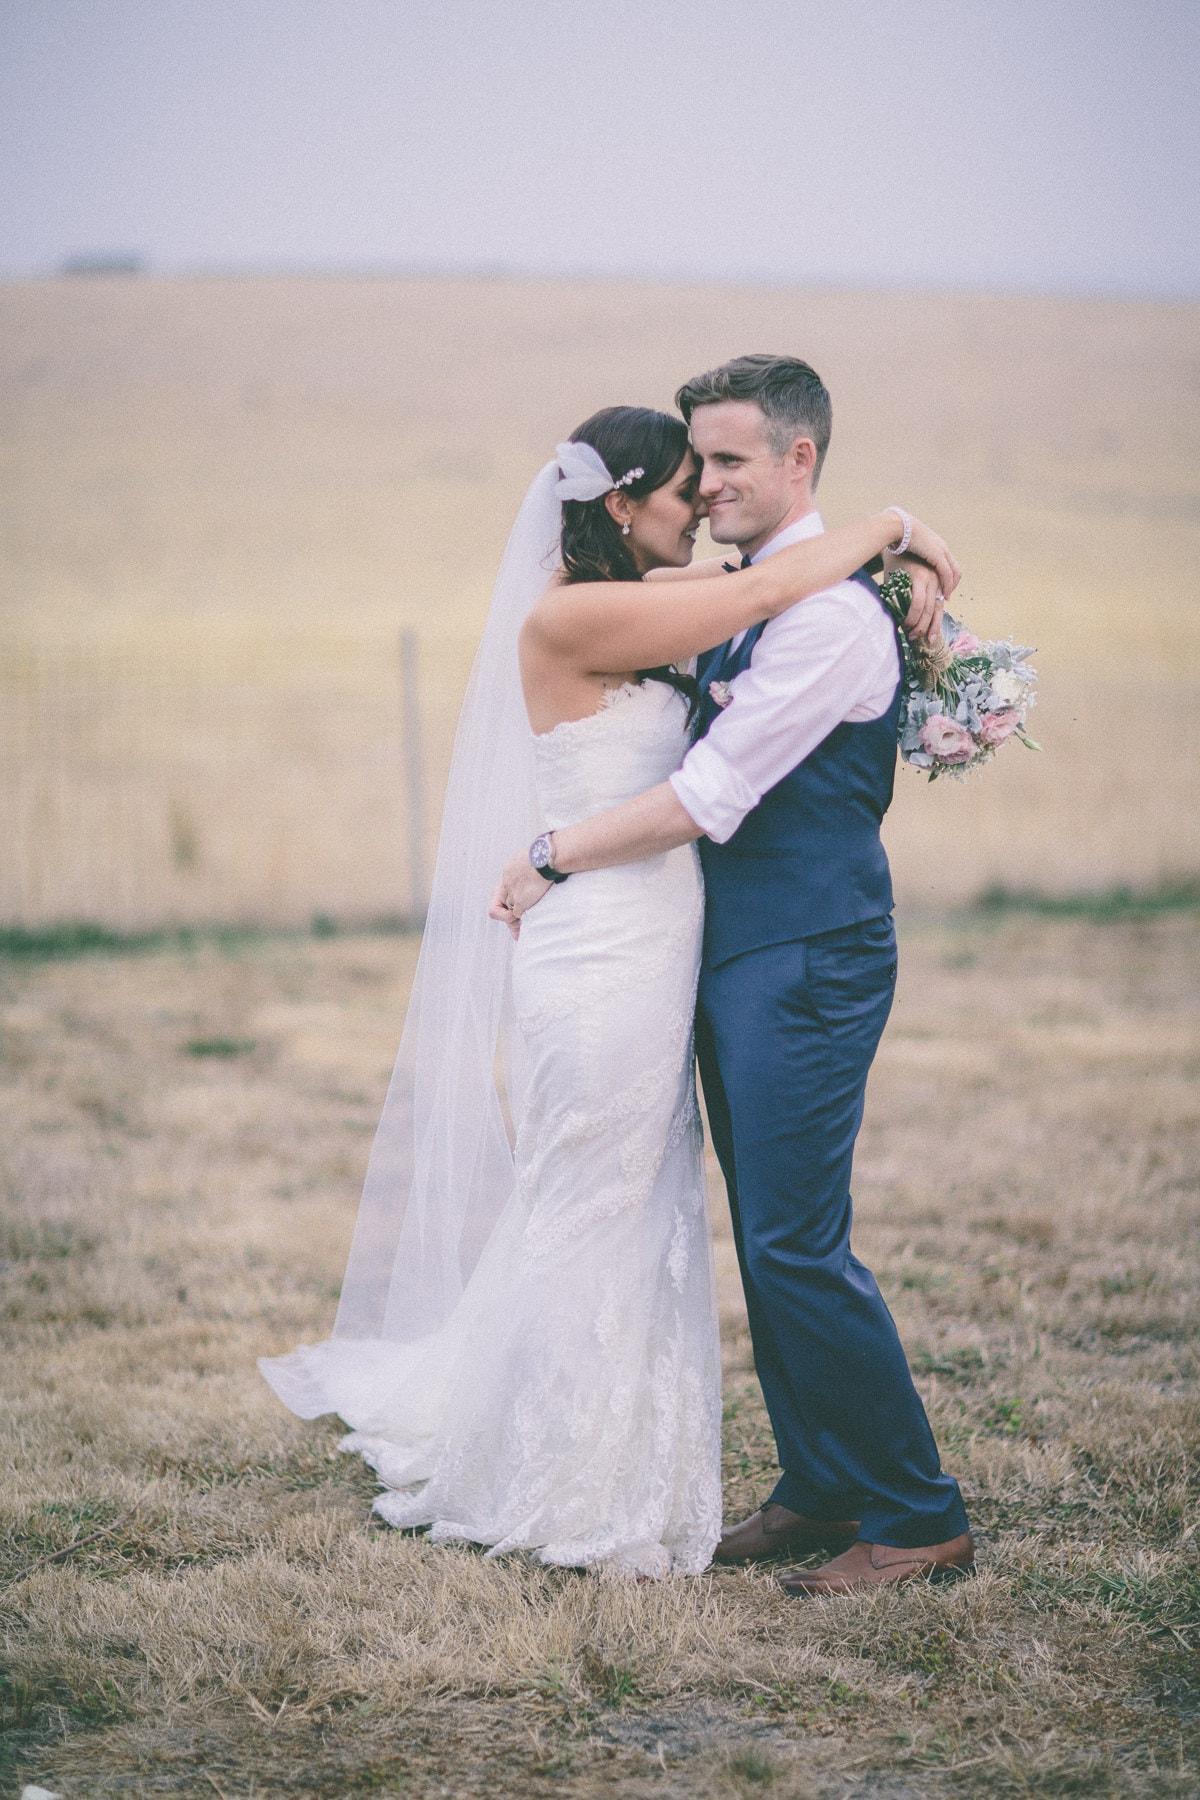 yarra valley near melbourne - creative wedding photographer